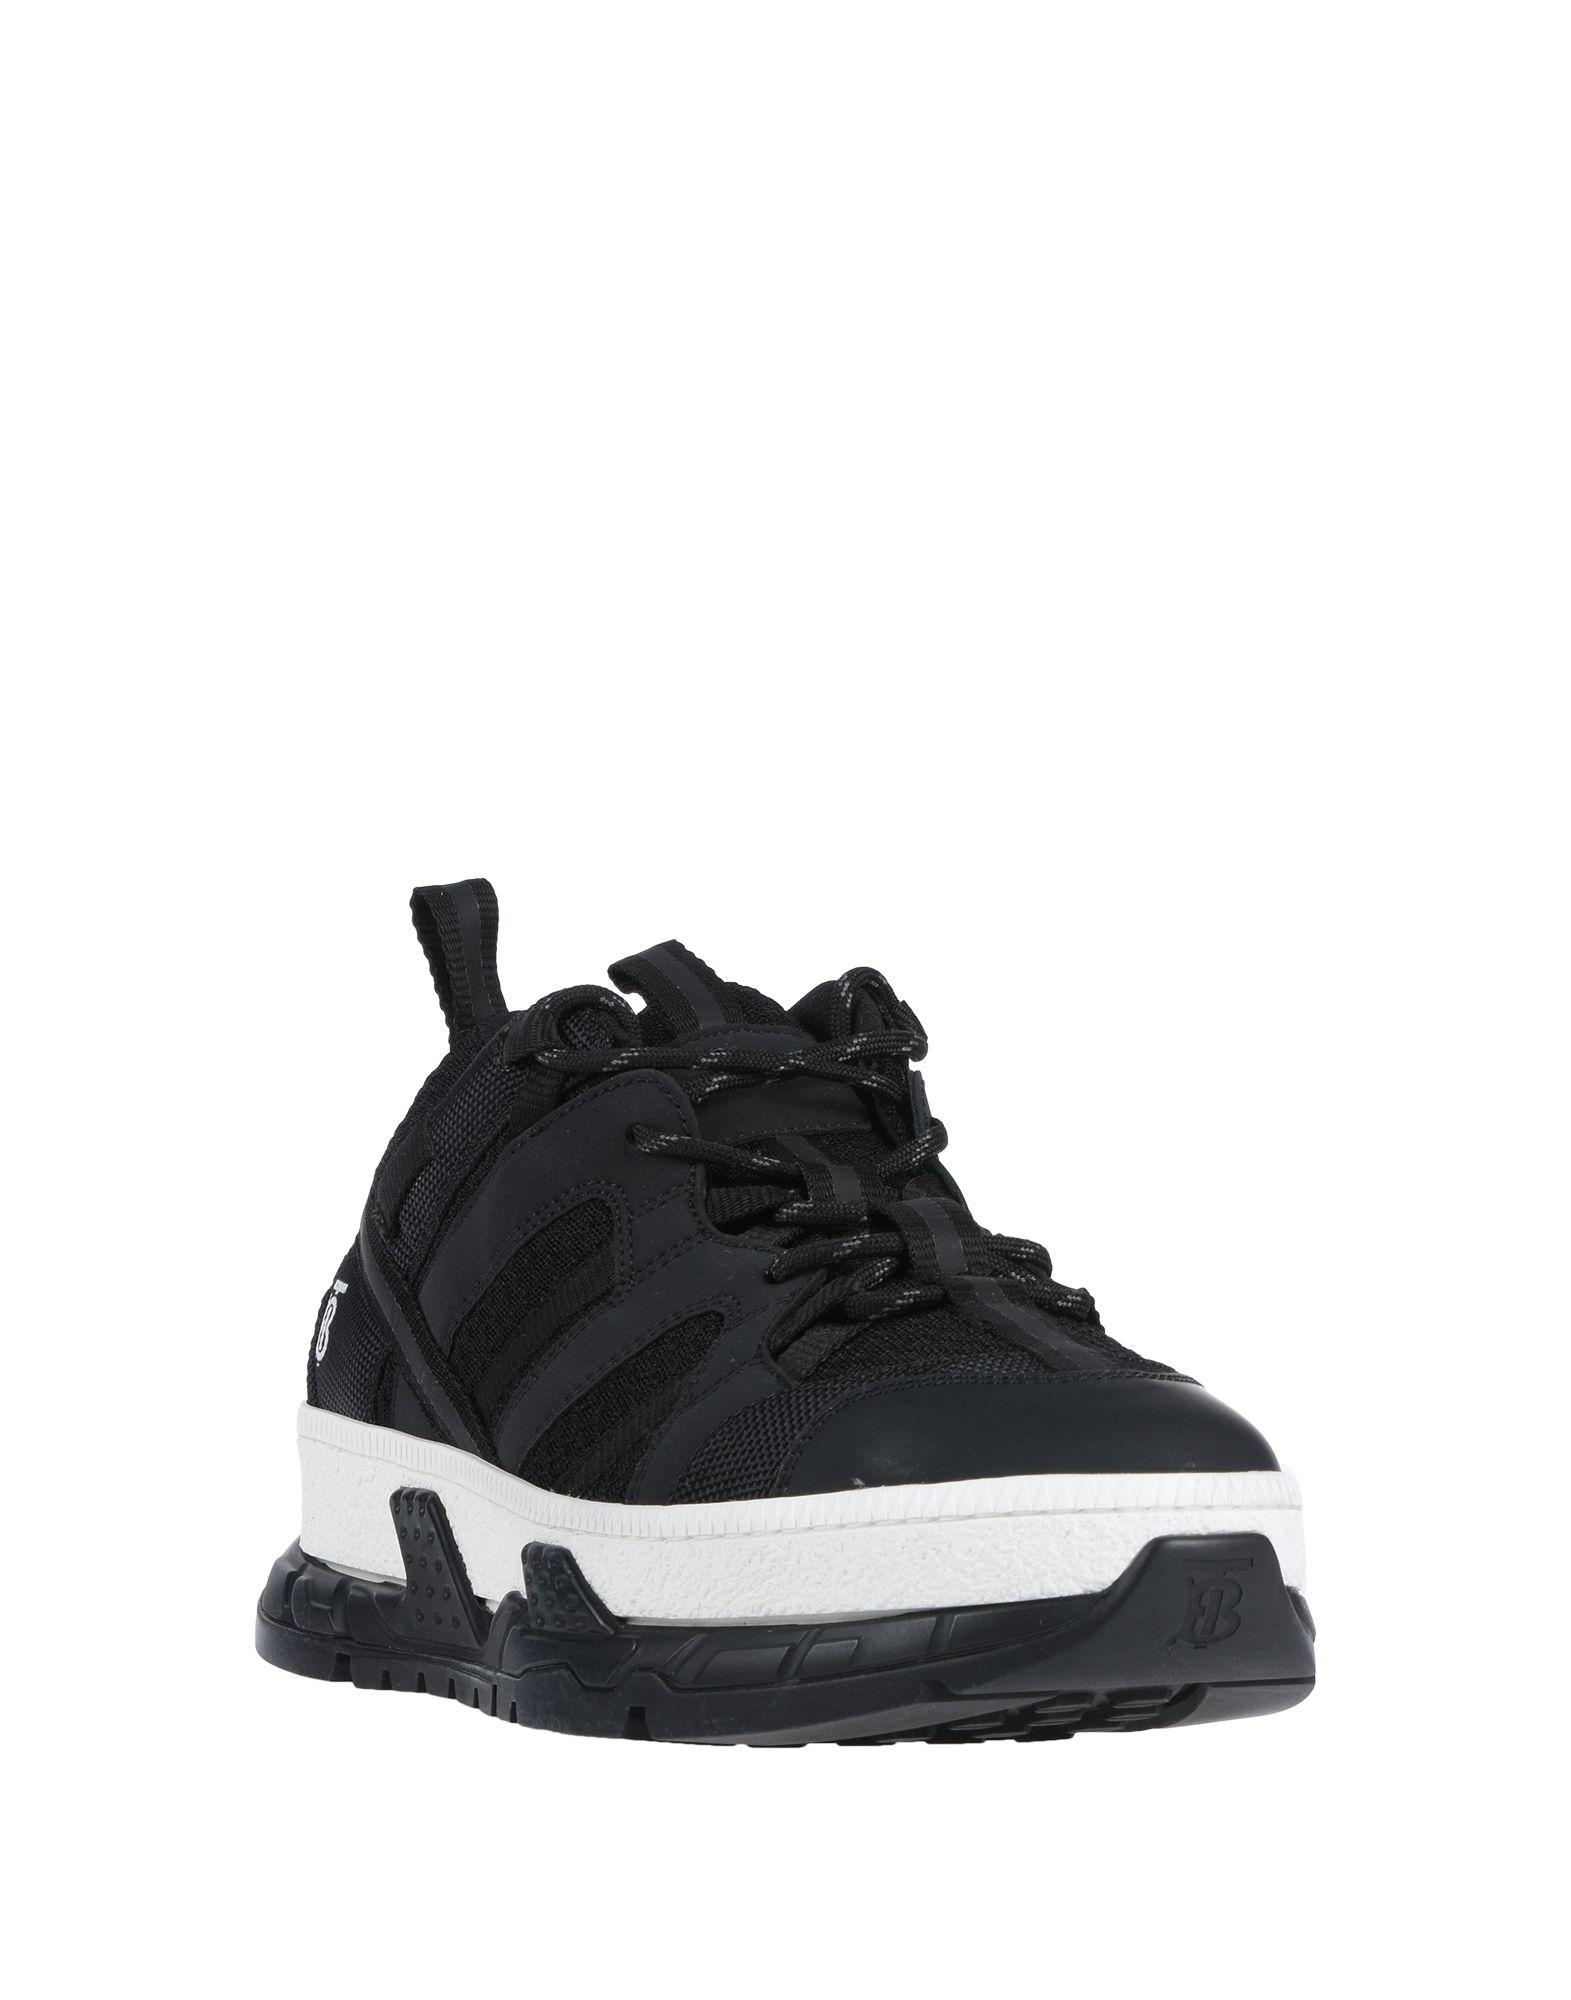 Sneakers & Deportivas Burberry de Caucho de color Negro para hombre